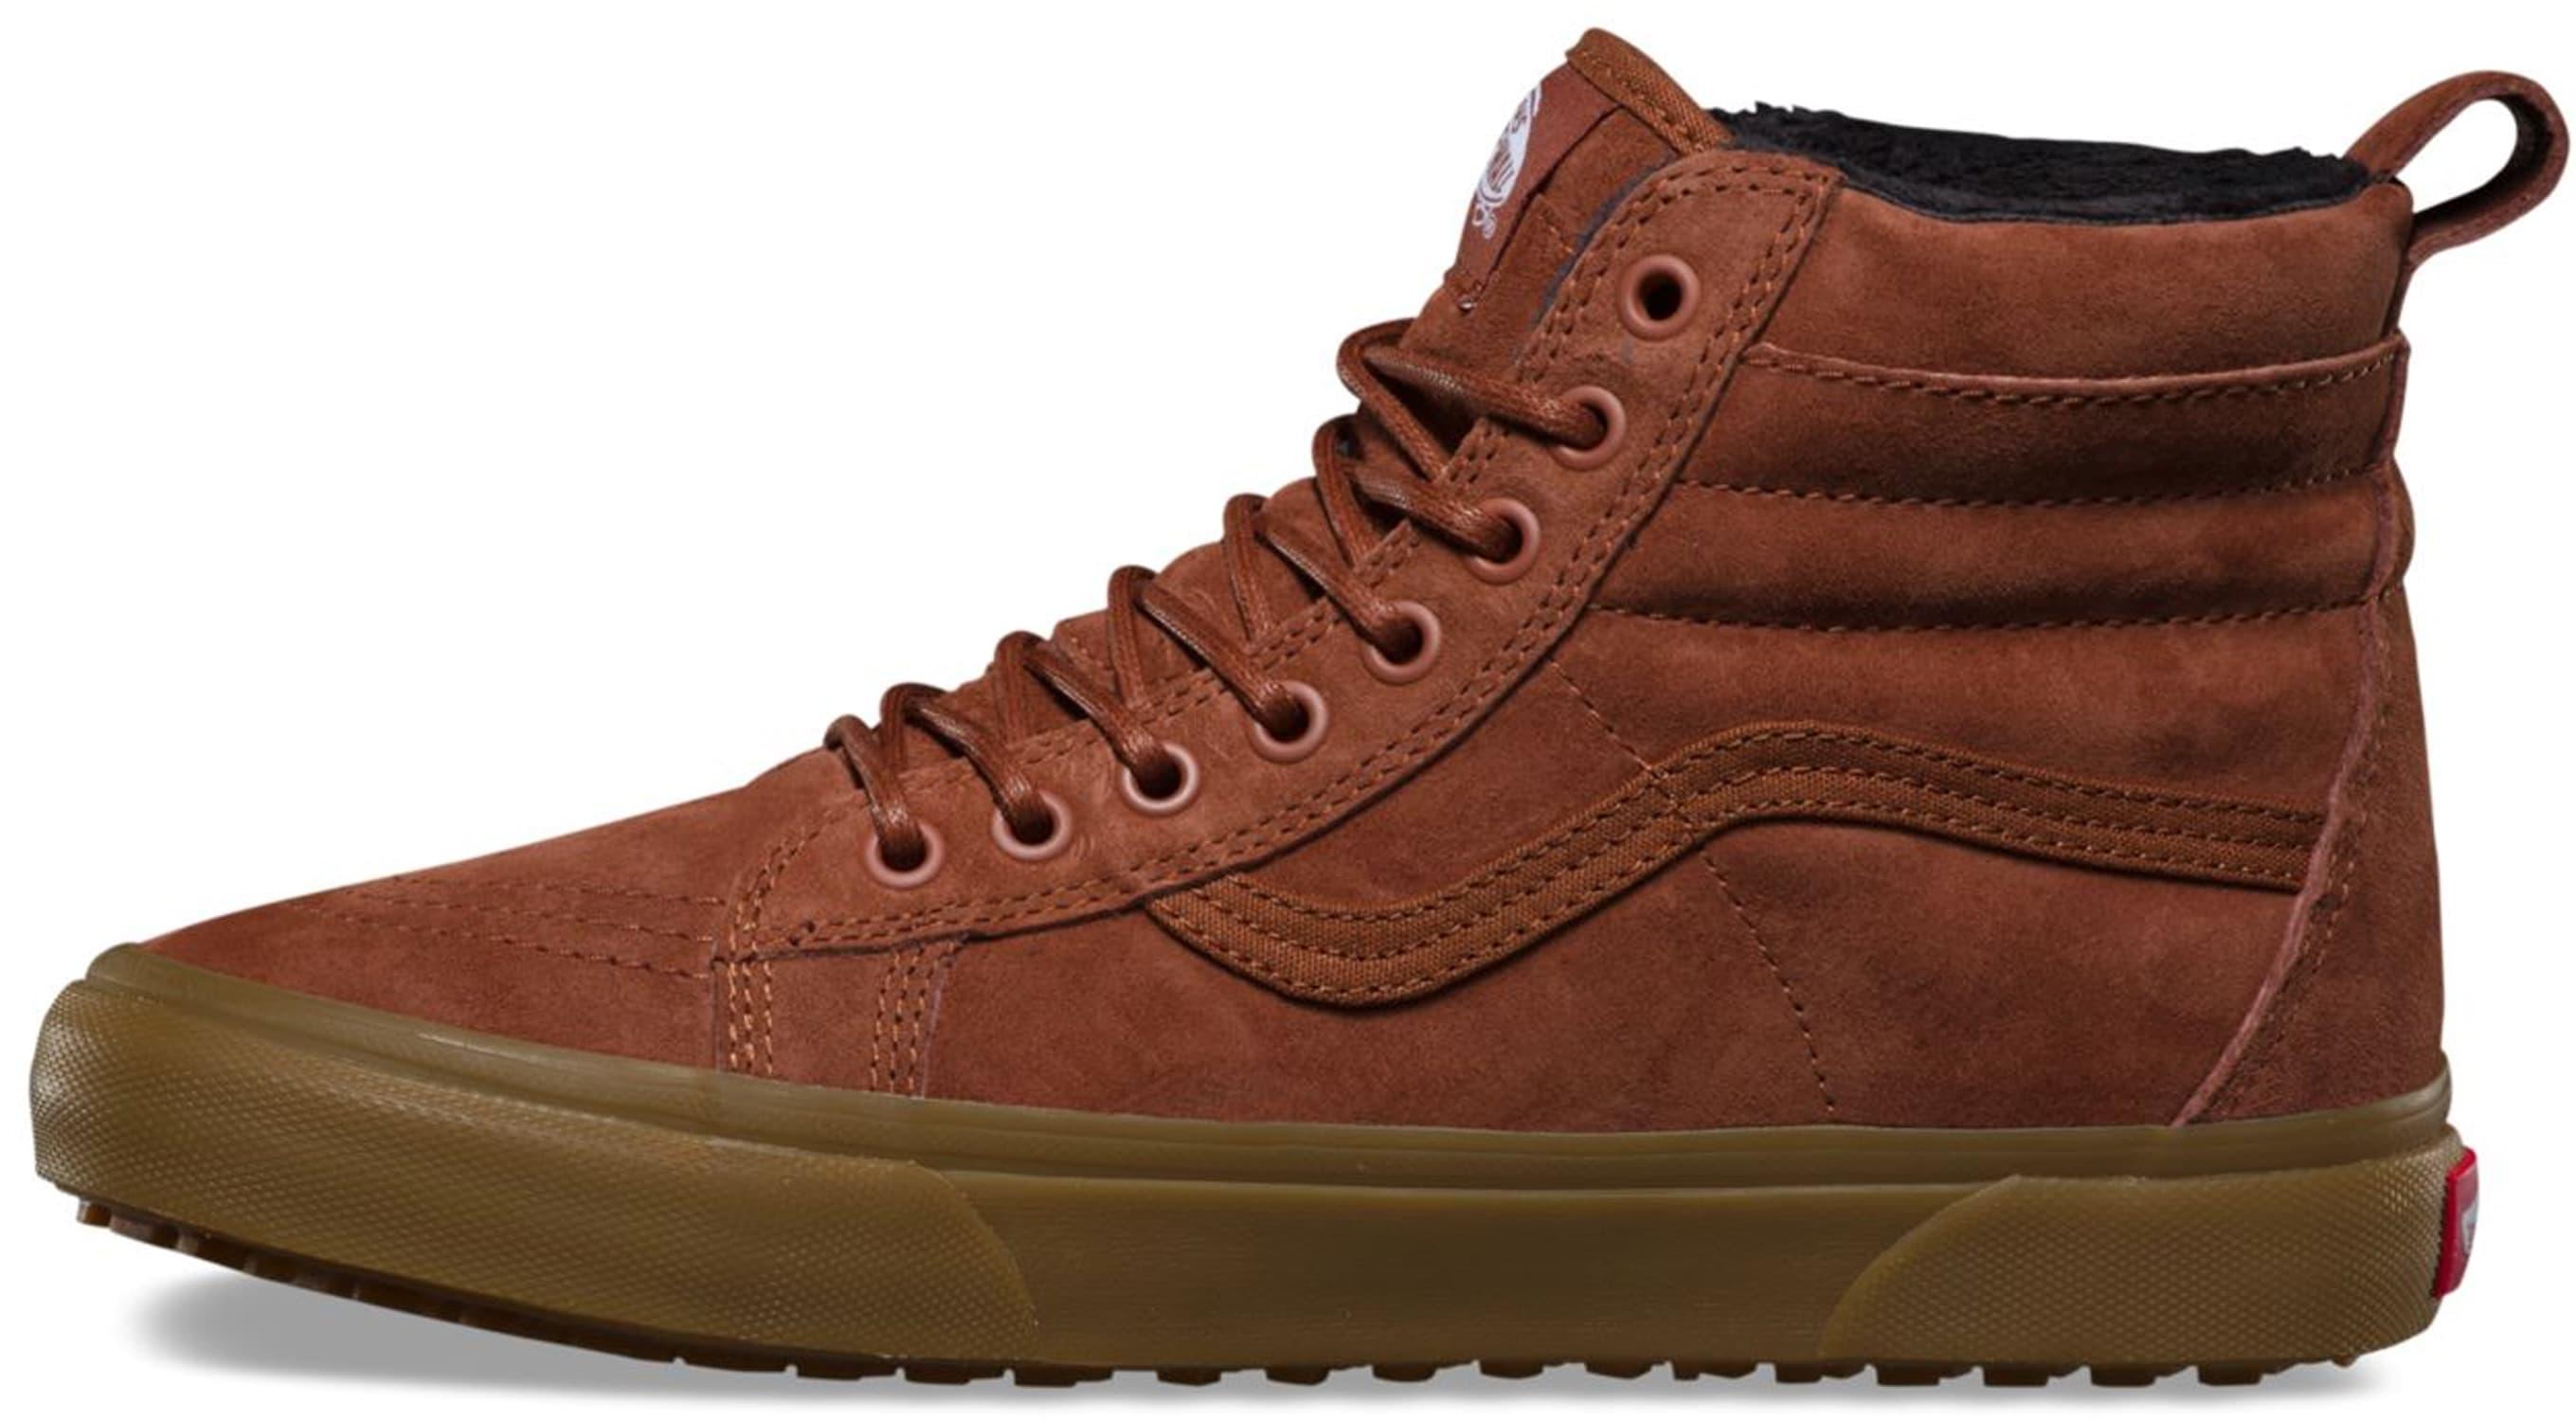 dbc916f004 Vans Sk8-Hi MTE Shoes - thumbnail 3